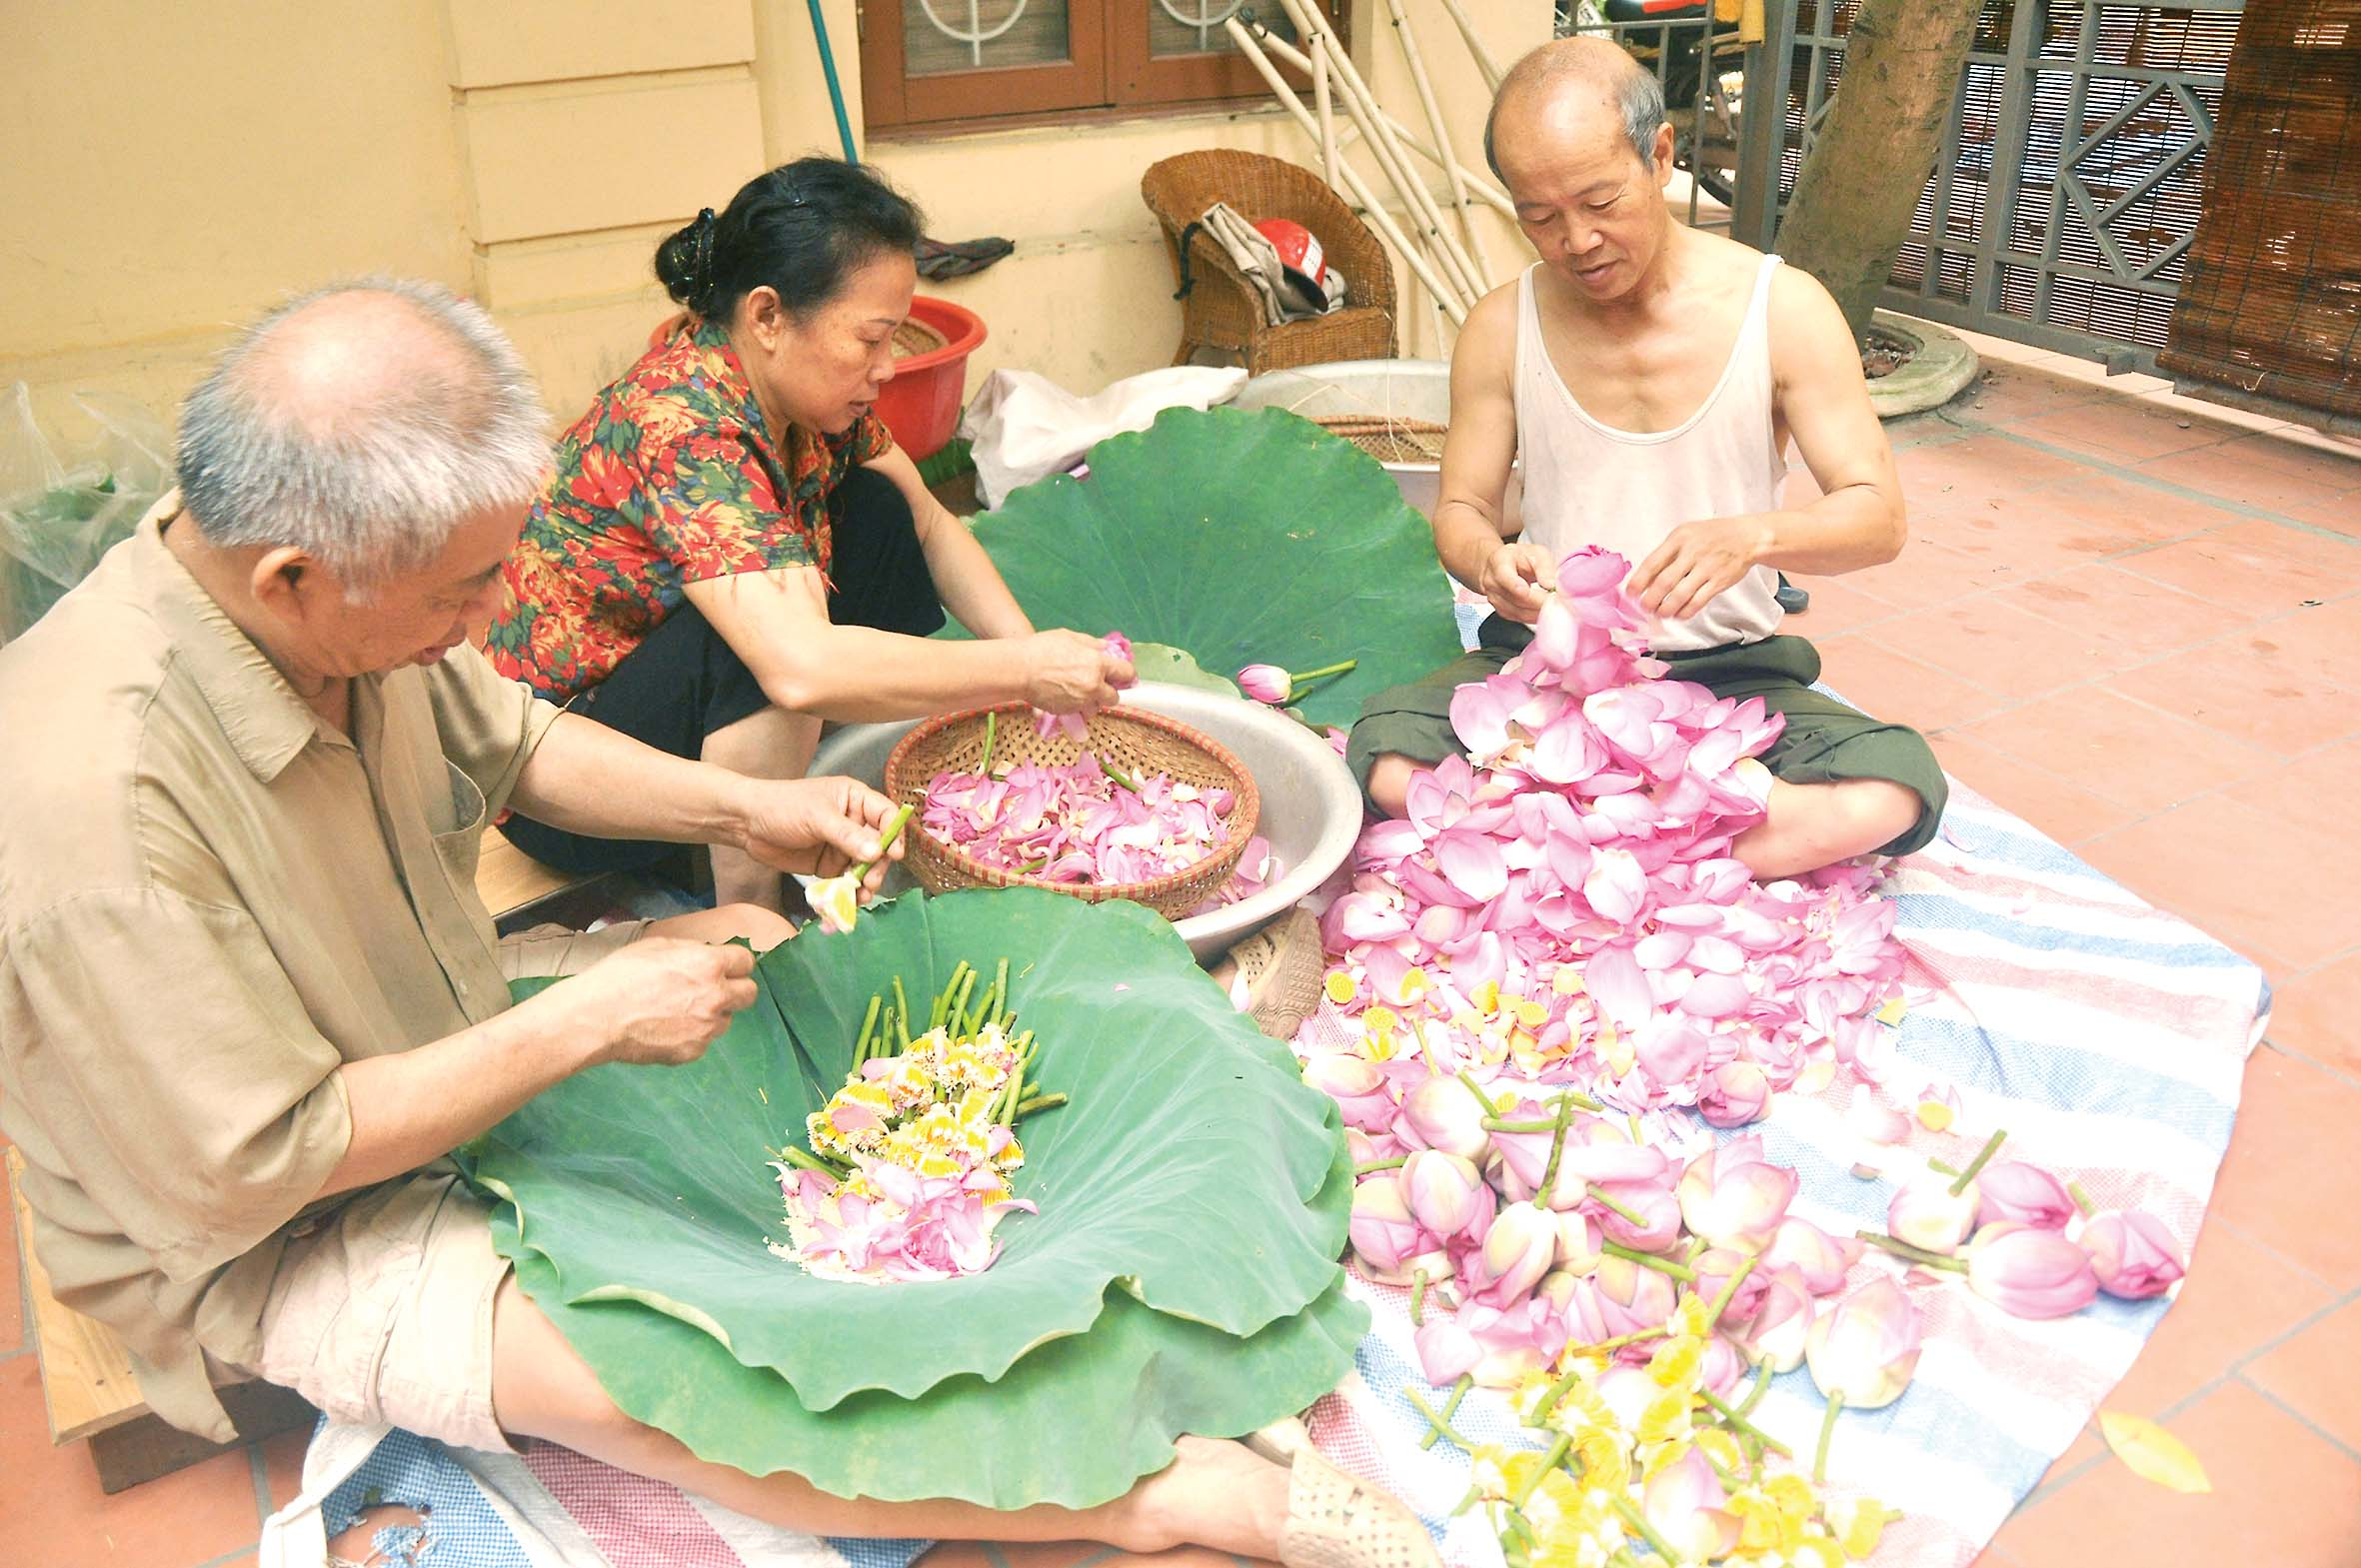 The dying art of embalming tea with lotus scent in Vietnam's capital